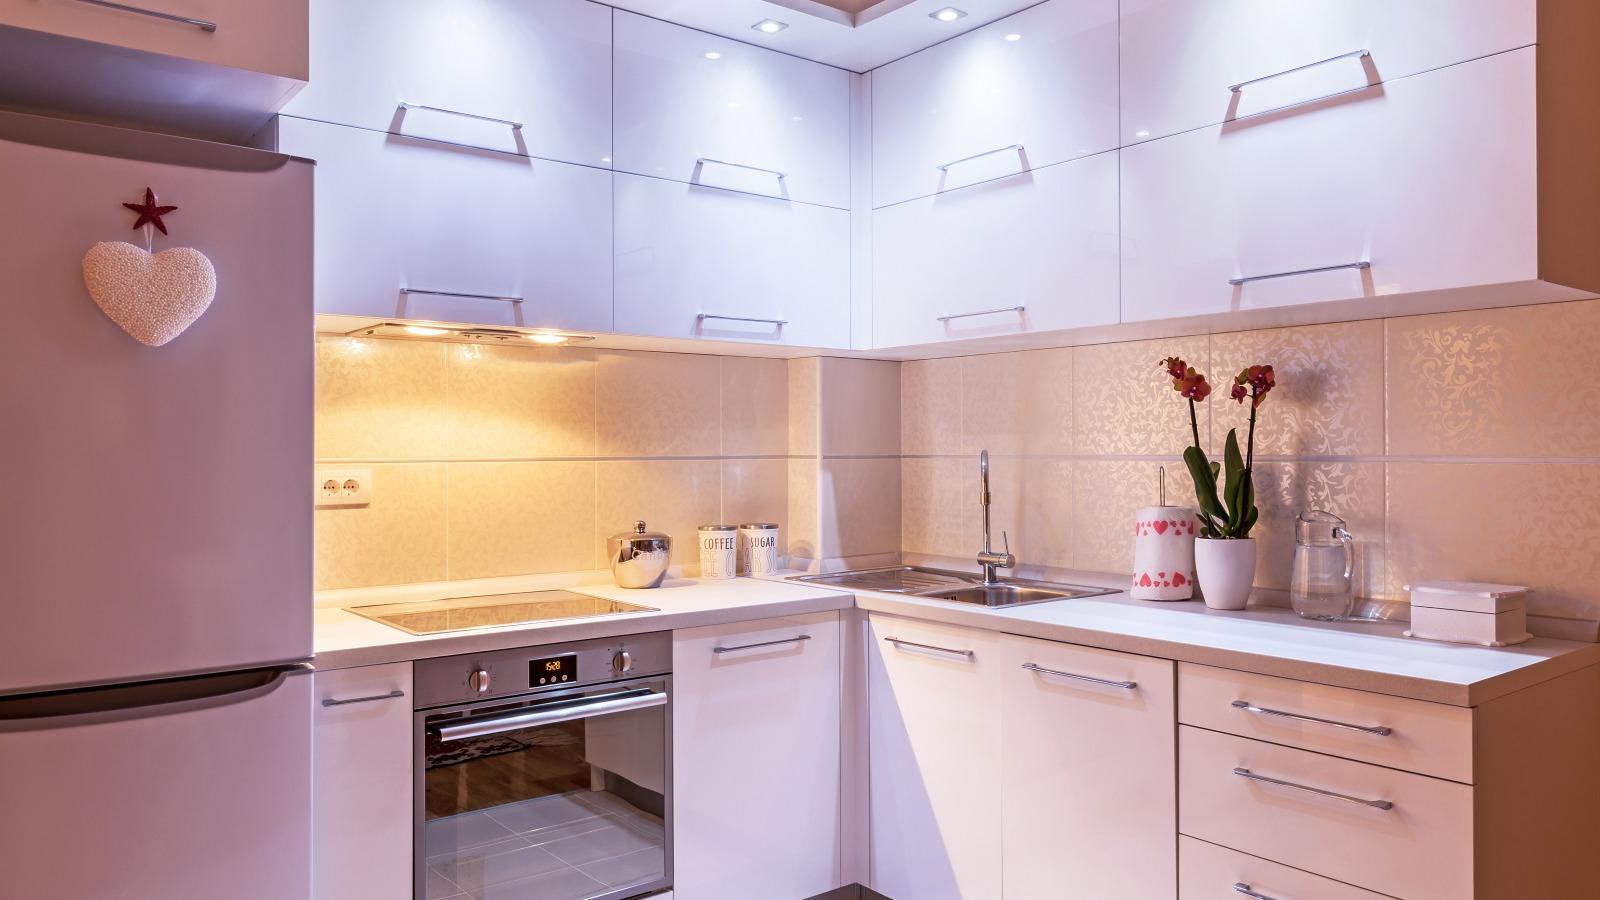 interior-design-kitchen-kukhnia-kholodilnik-plita-mebel-rosk.jpg